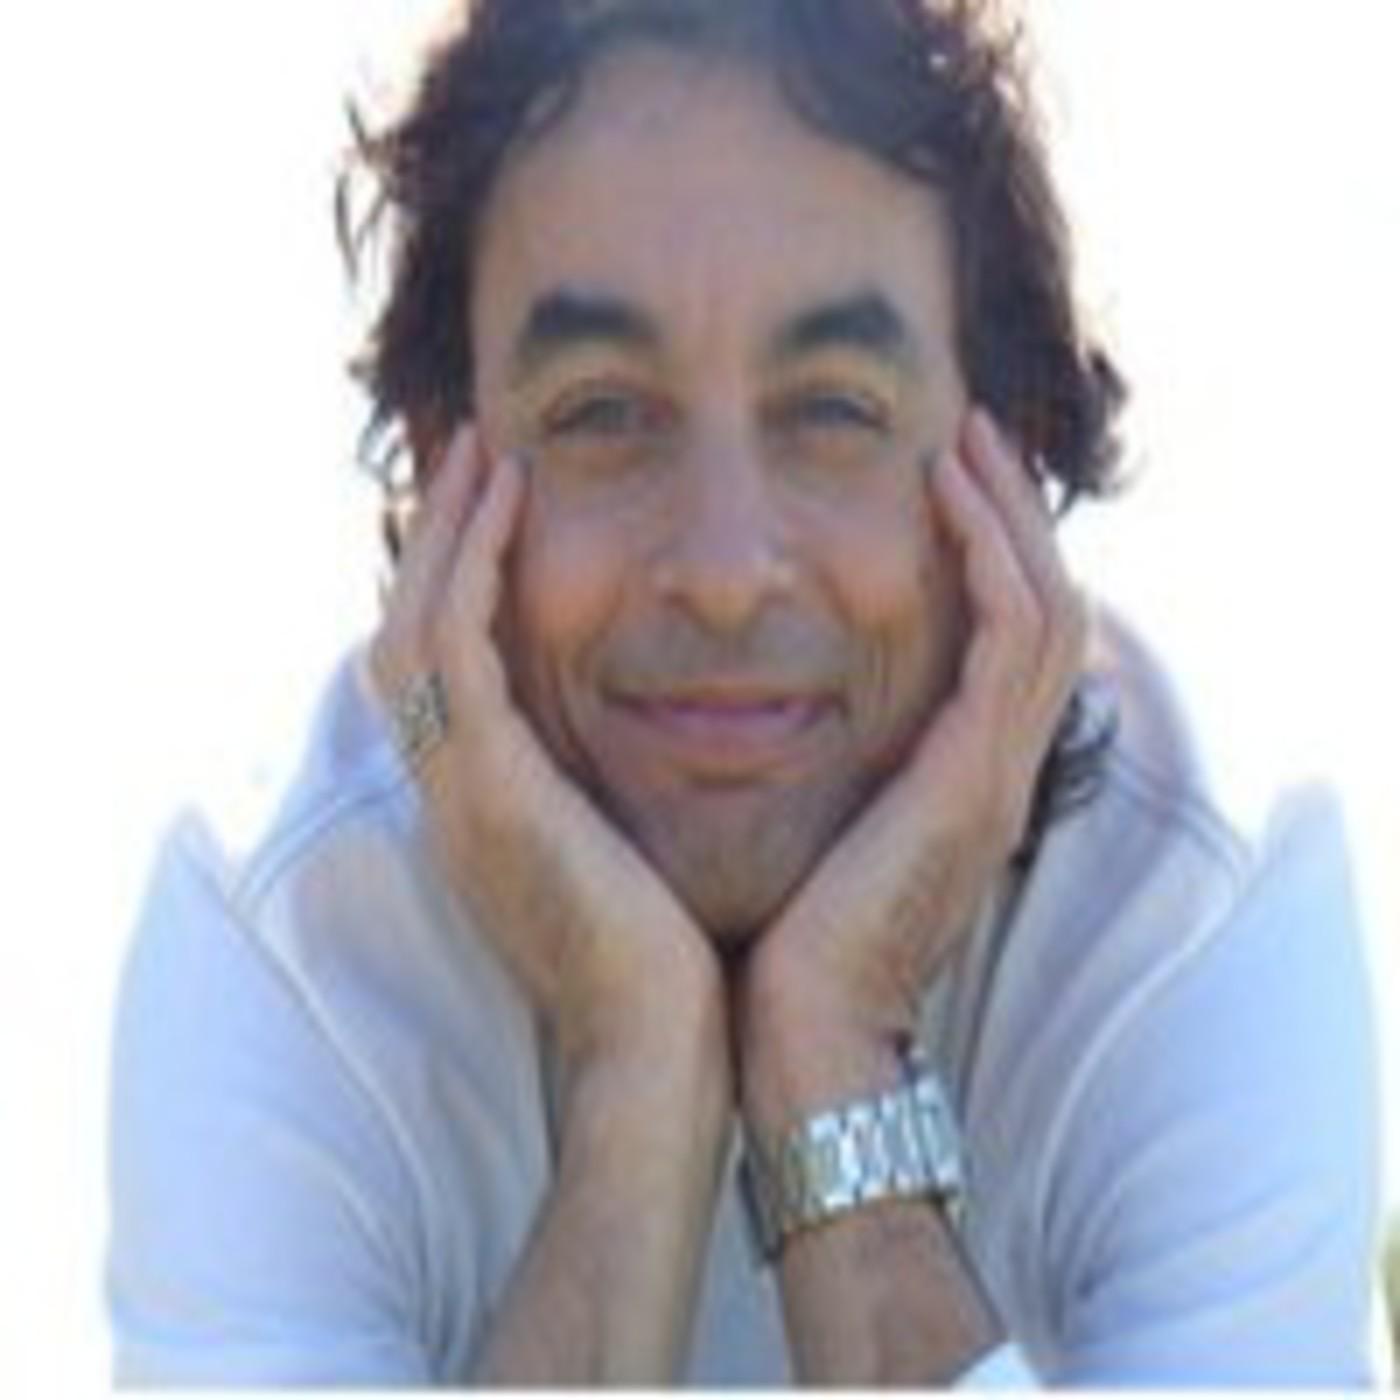 No busques ser feliz - Rodrigo Joaquín del Pino (Rama)